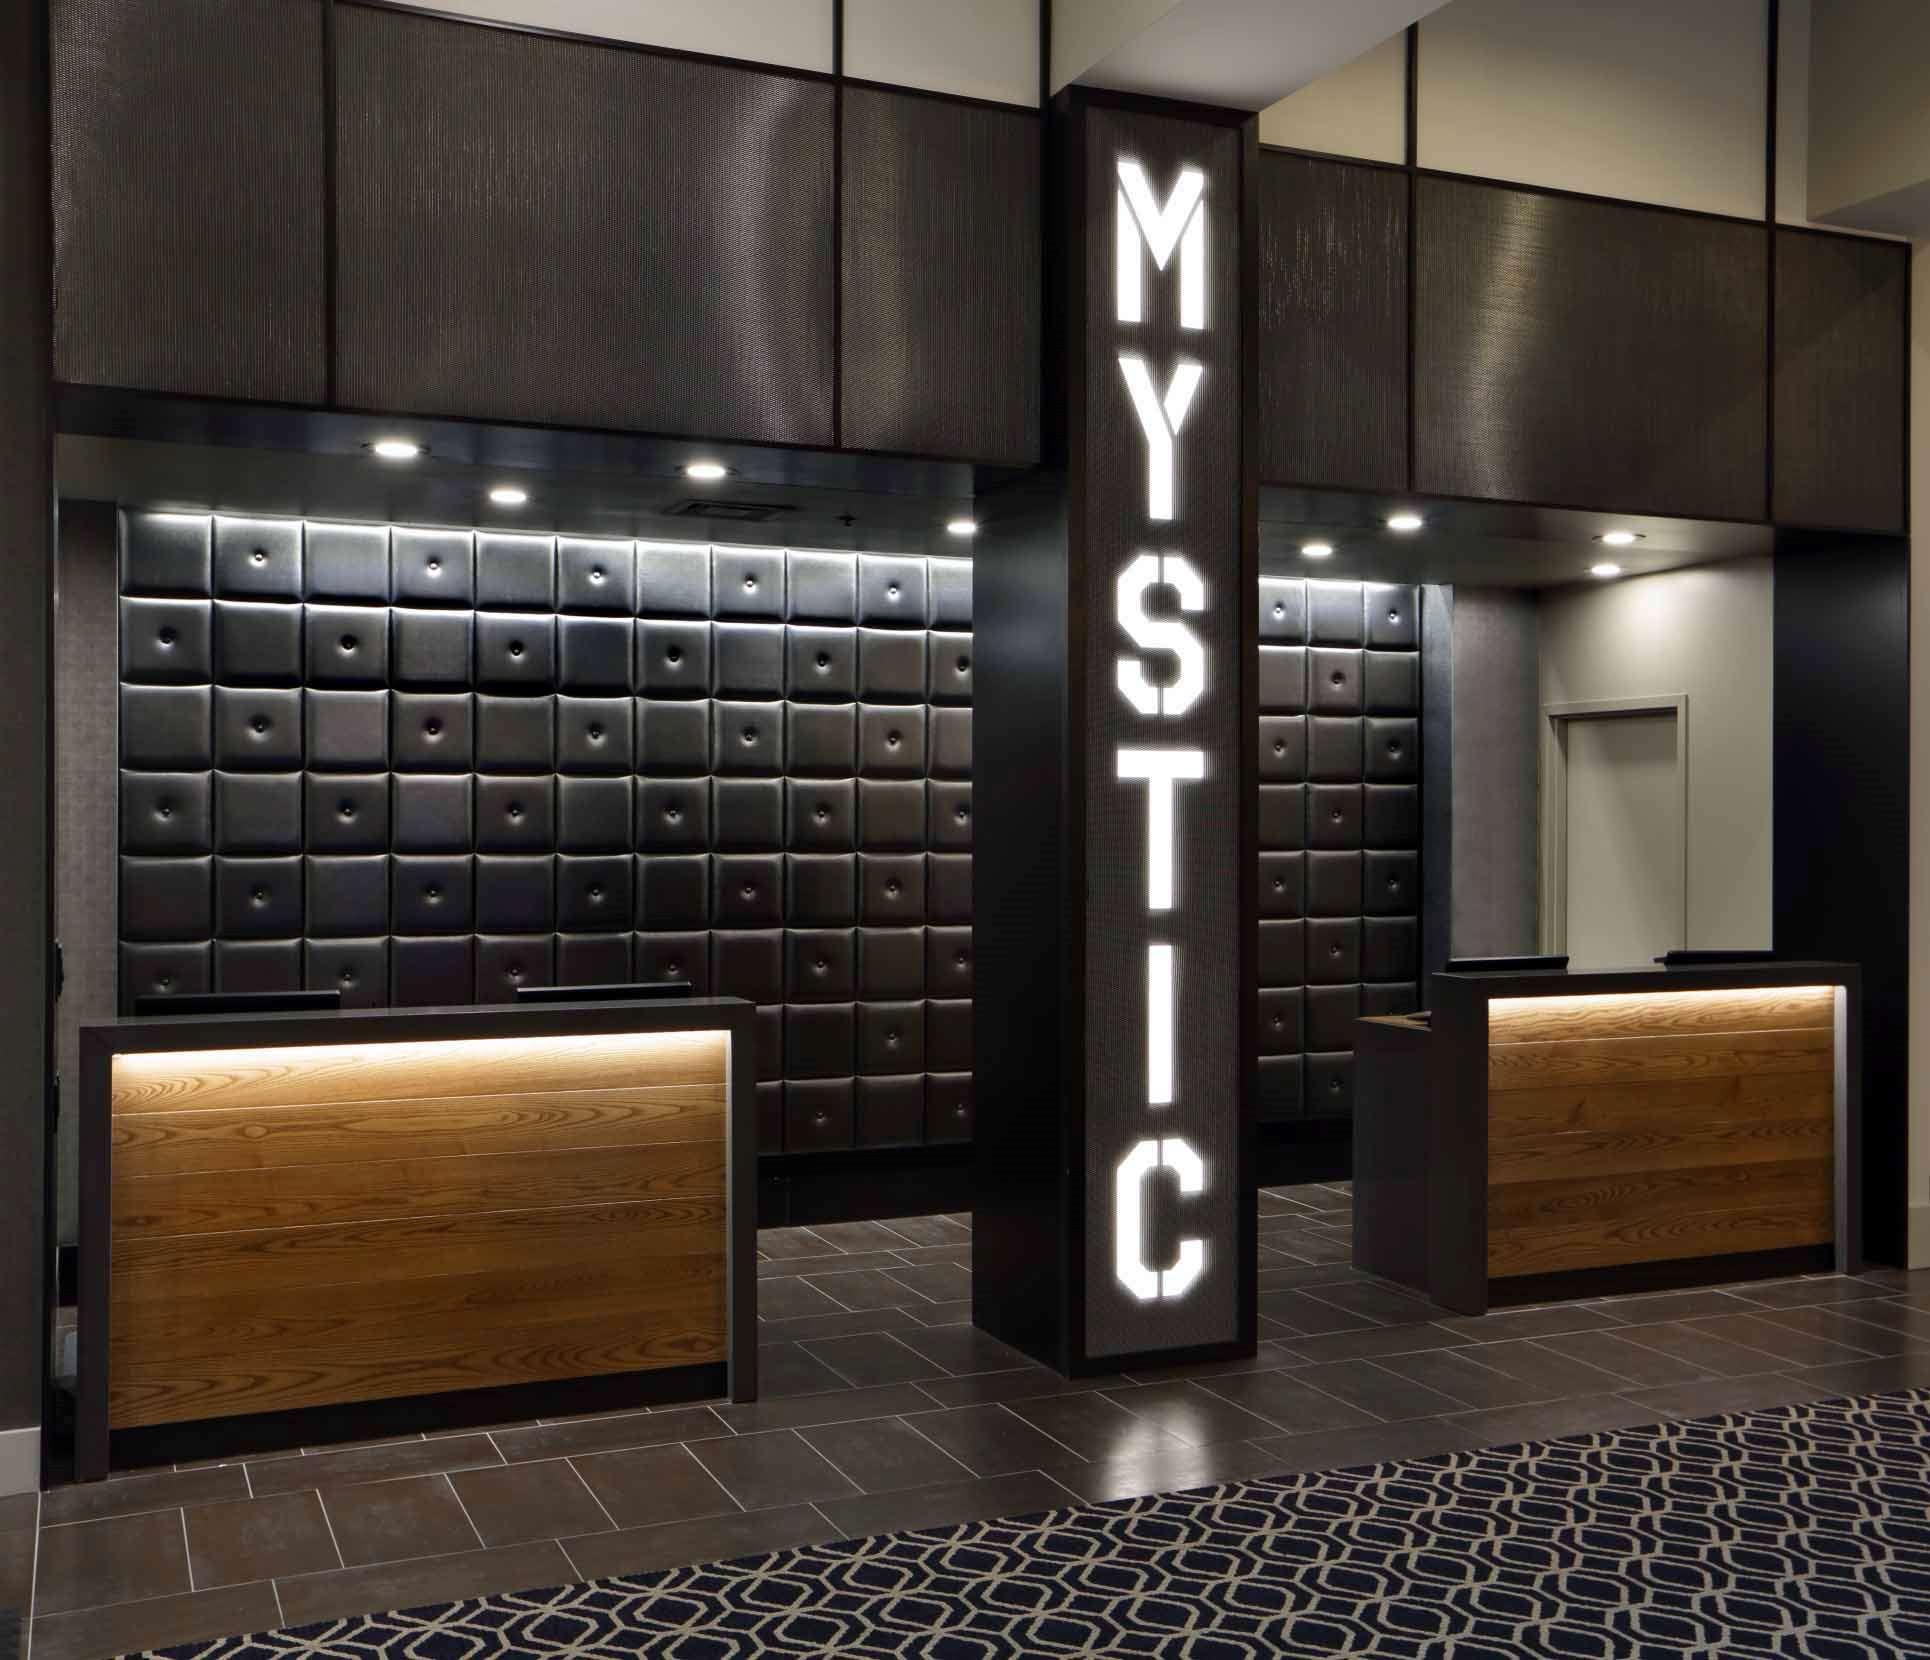 Hilton Mystic image 5